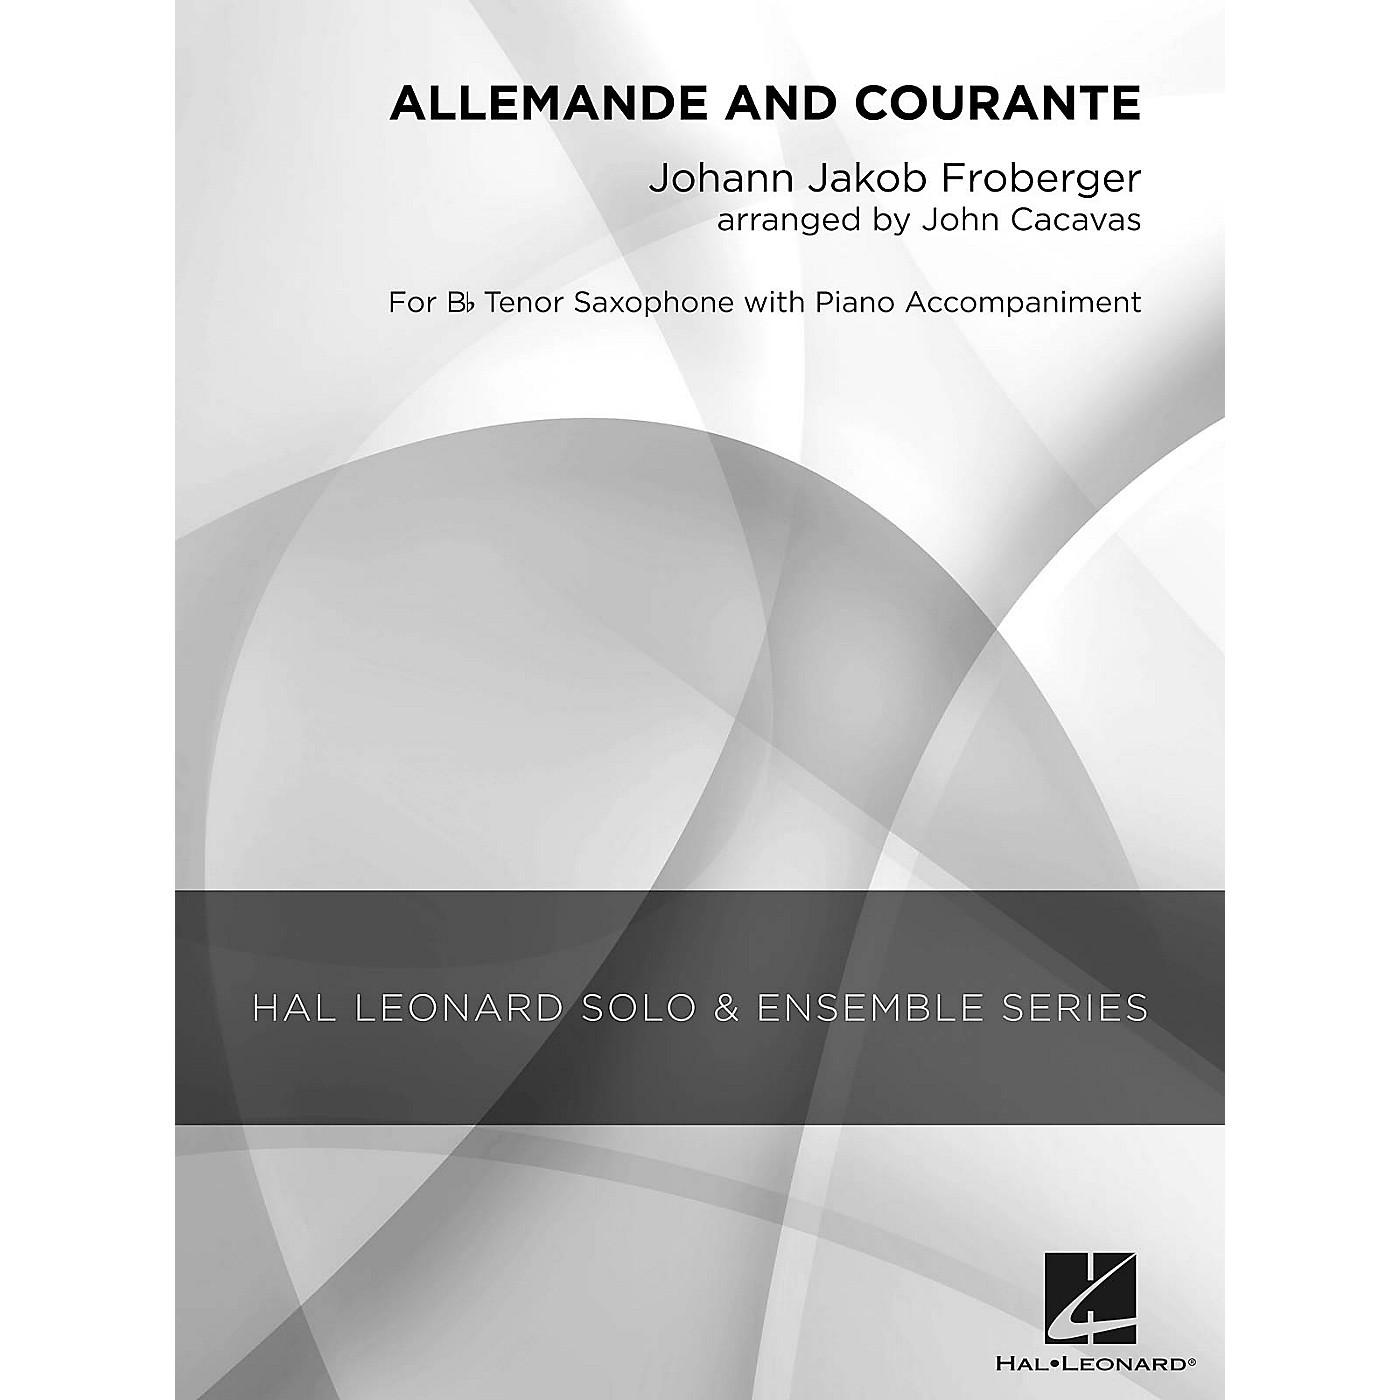 Hal Leonard Allemande and Courante (Grade 3 Tenor Saxophone Solo) Concert Band Level 3 Arranged by John Cacavas thumbnail